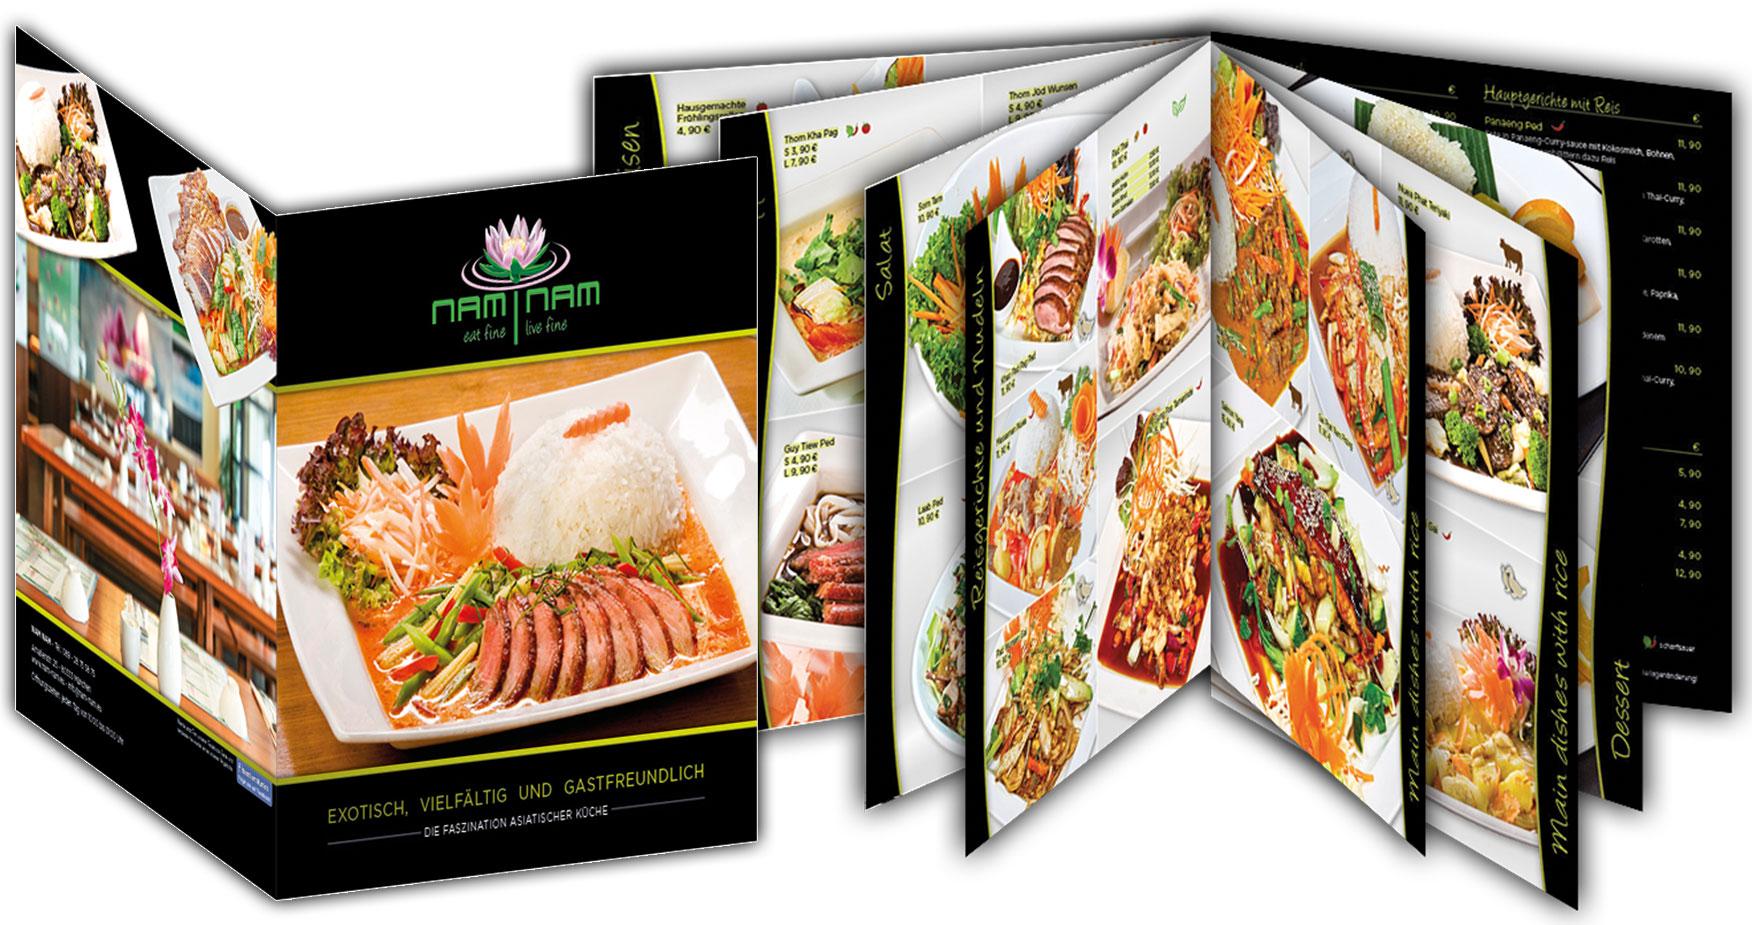 Asia-Speisekarte-Restaurant-Menukarte-Gastronomie-NamNam-Speisebilder-Quadrat-DNZ-Networks